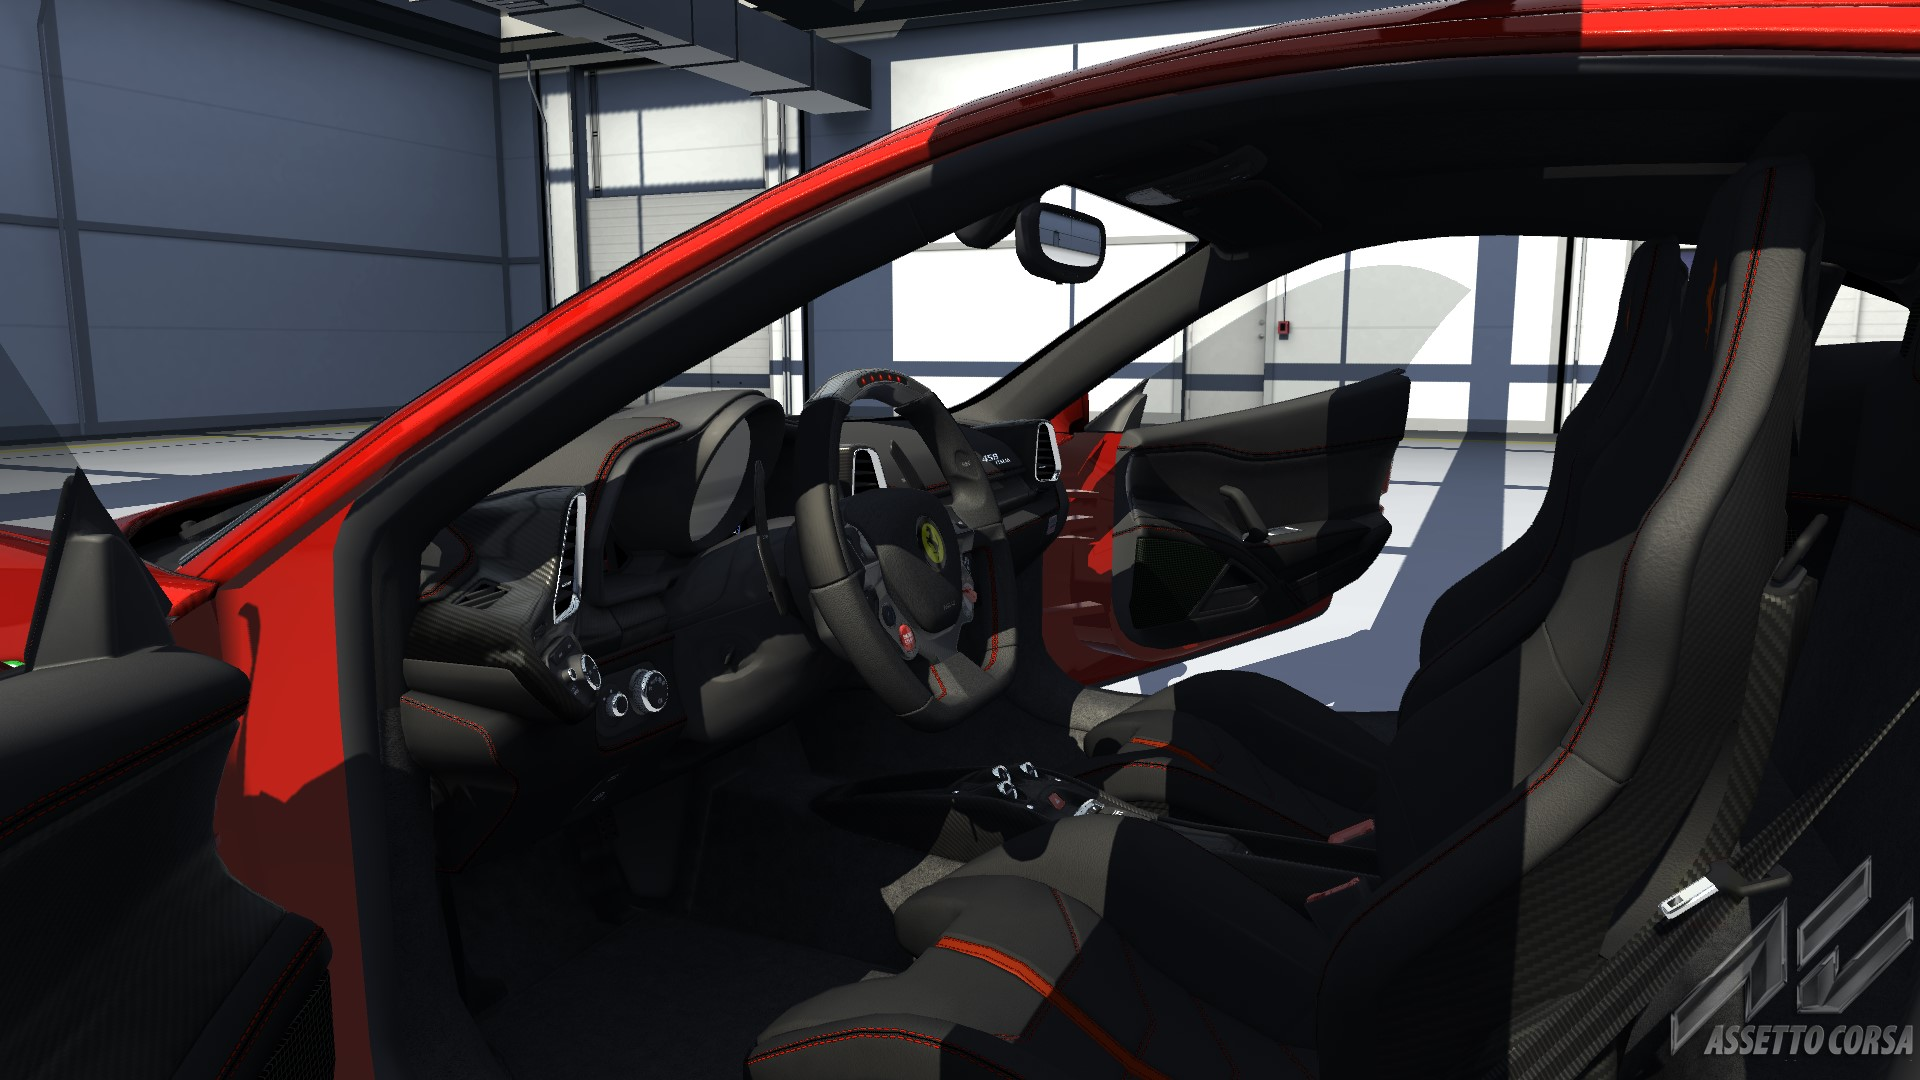 Assetto Corsa 0901m